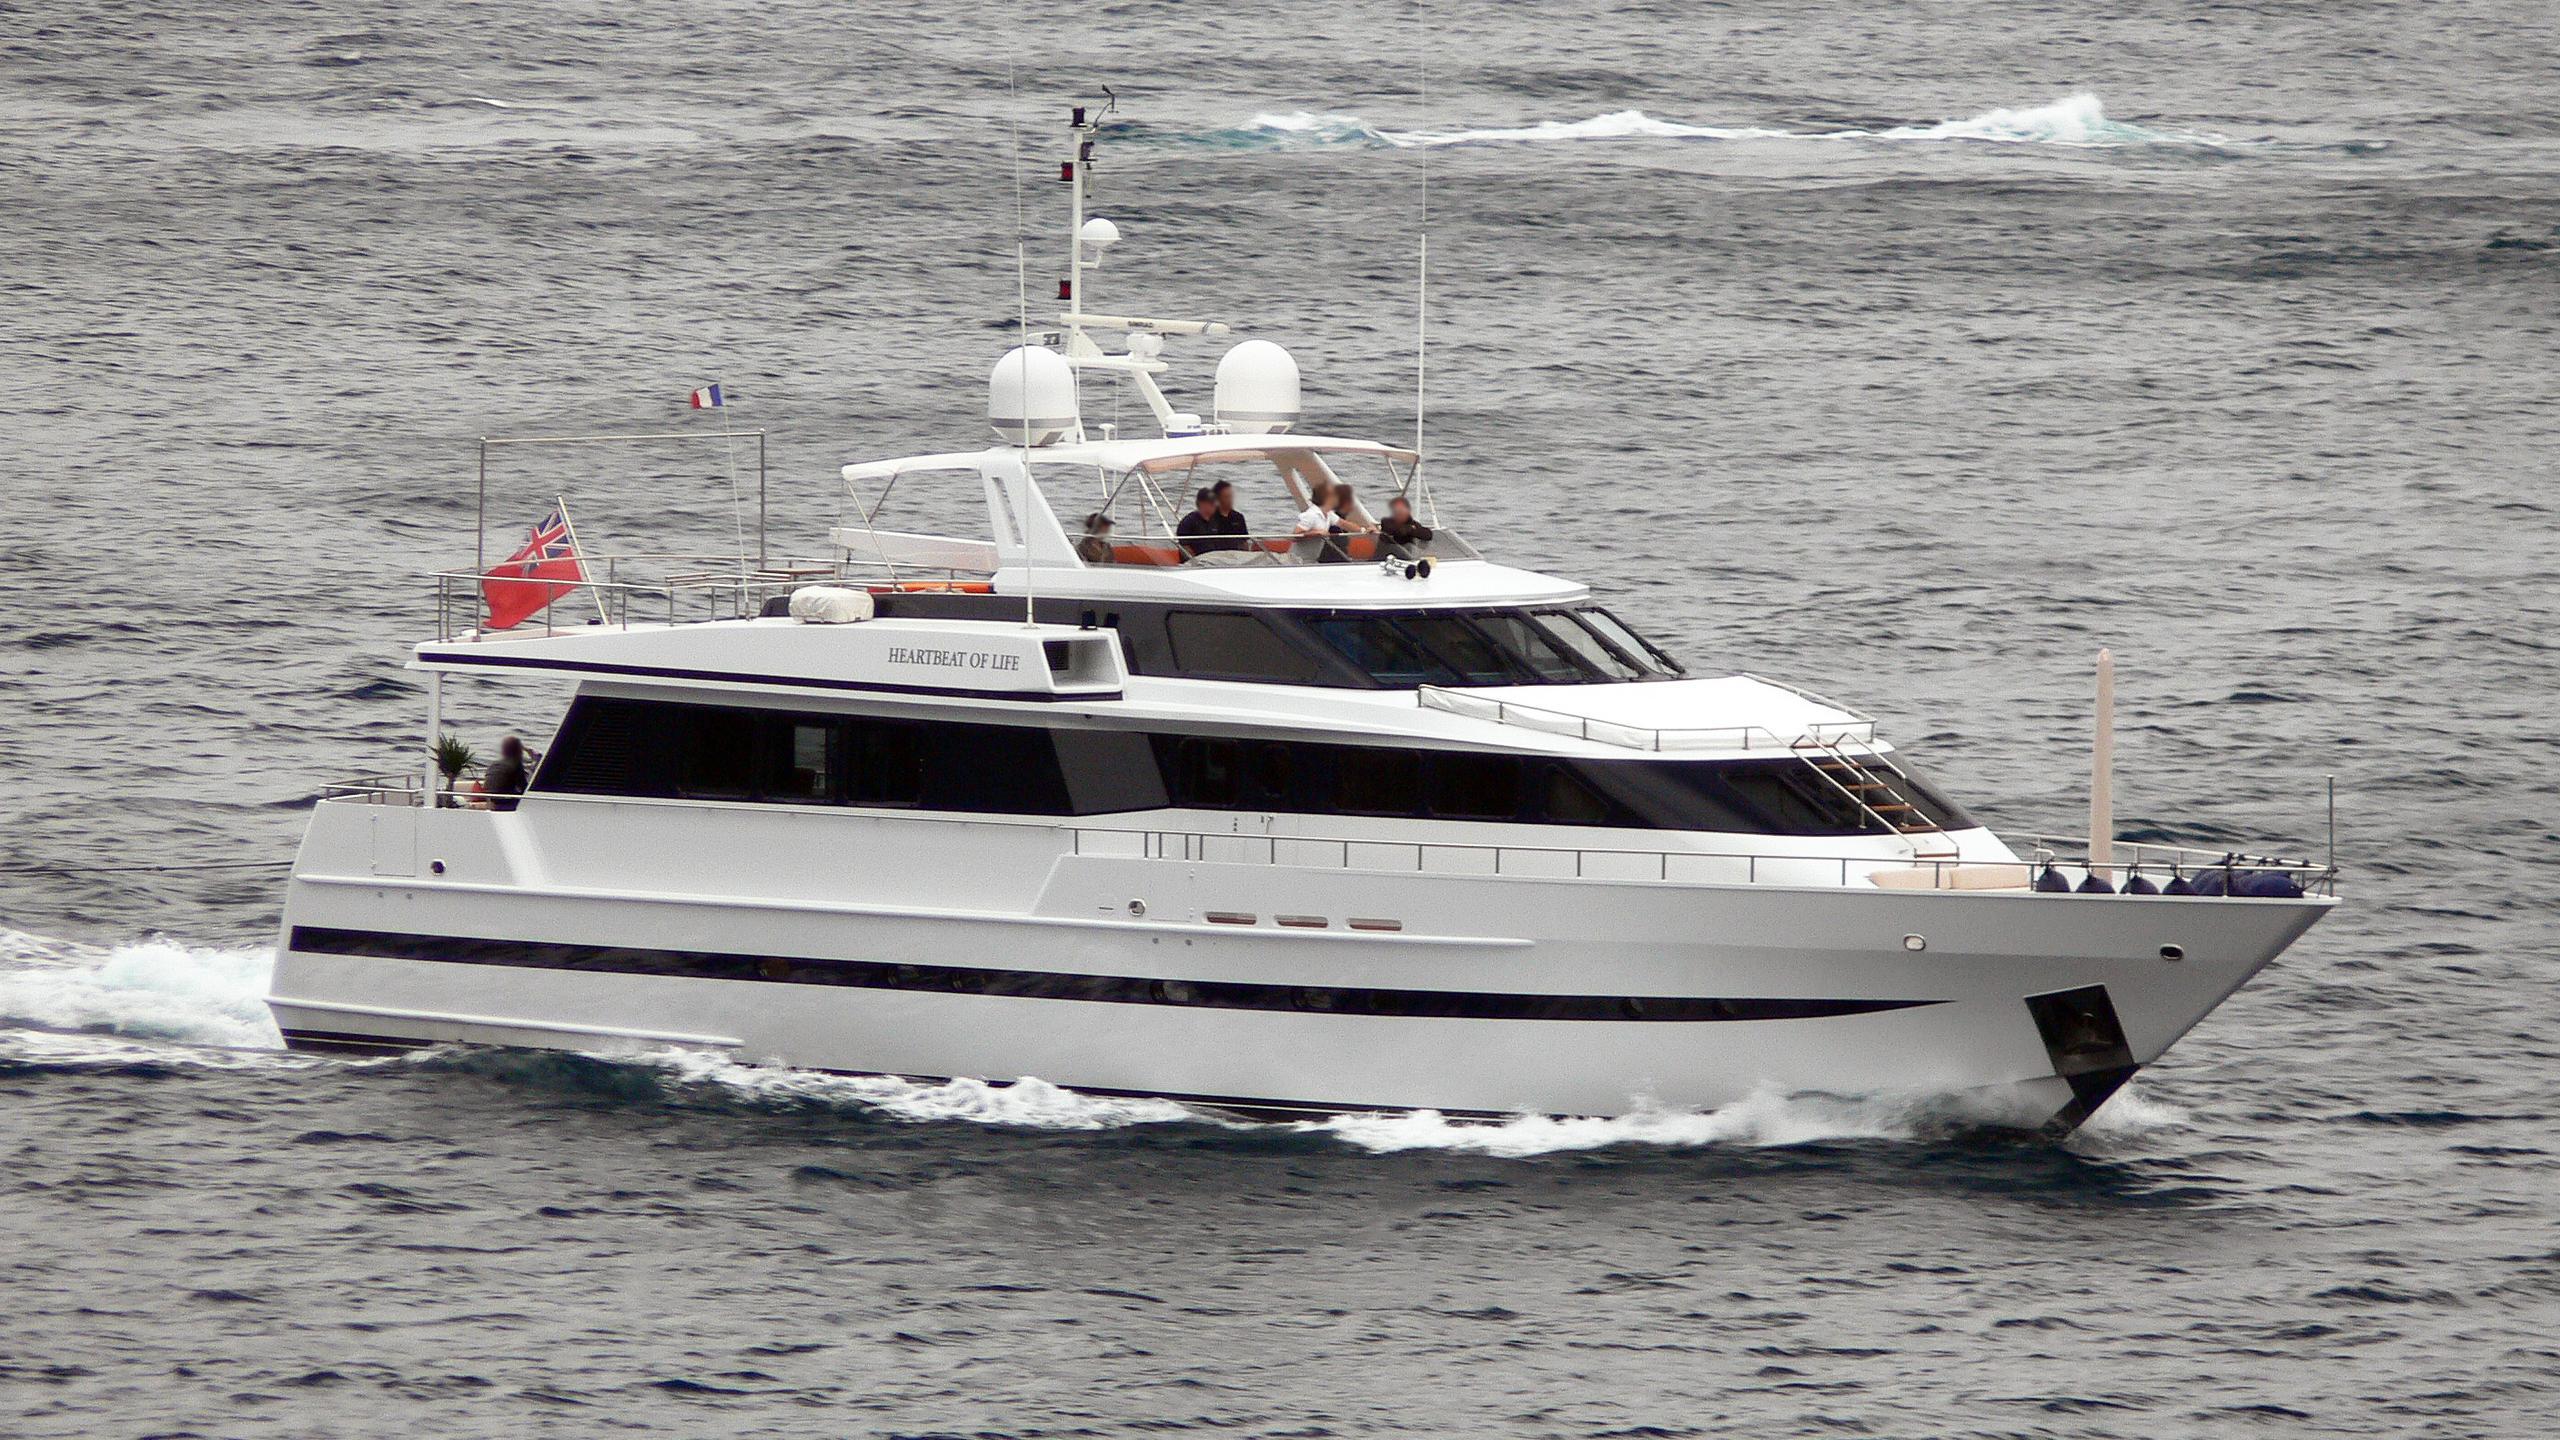 heartbeat-of-life-motor-yacht-heesen-1989-28m-cruising